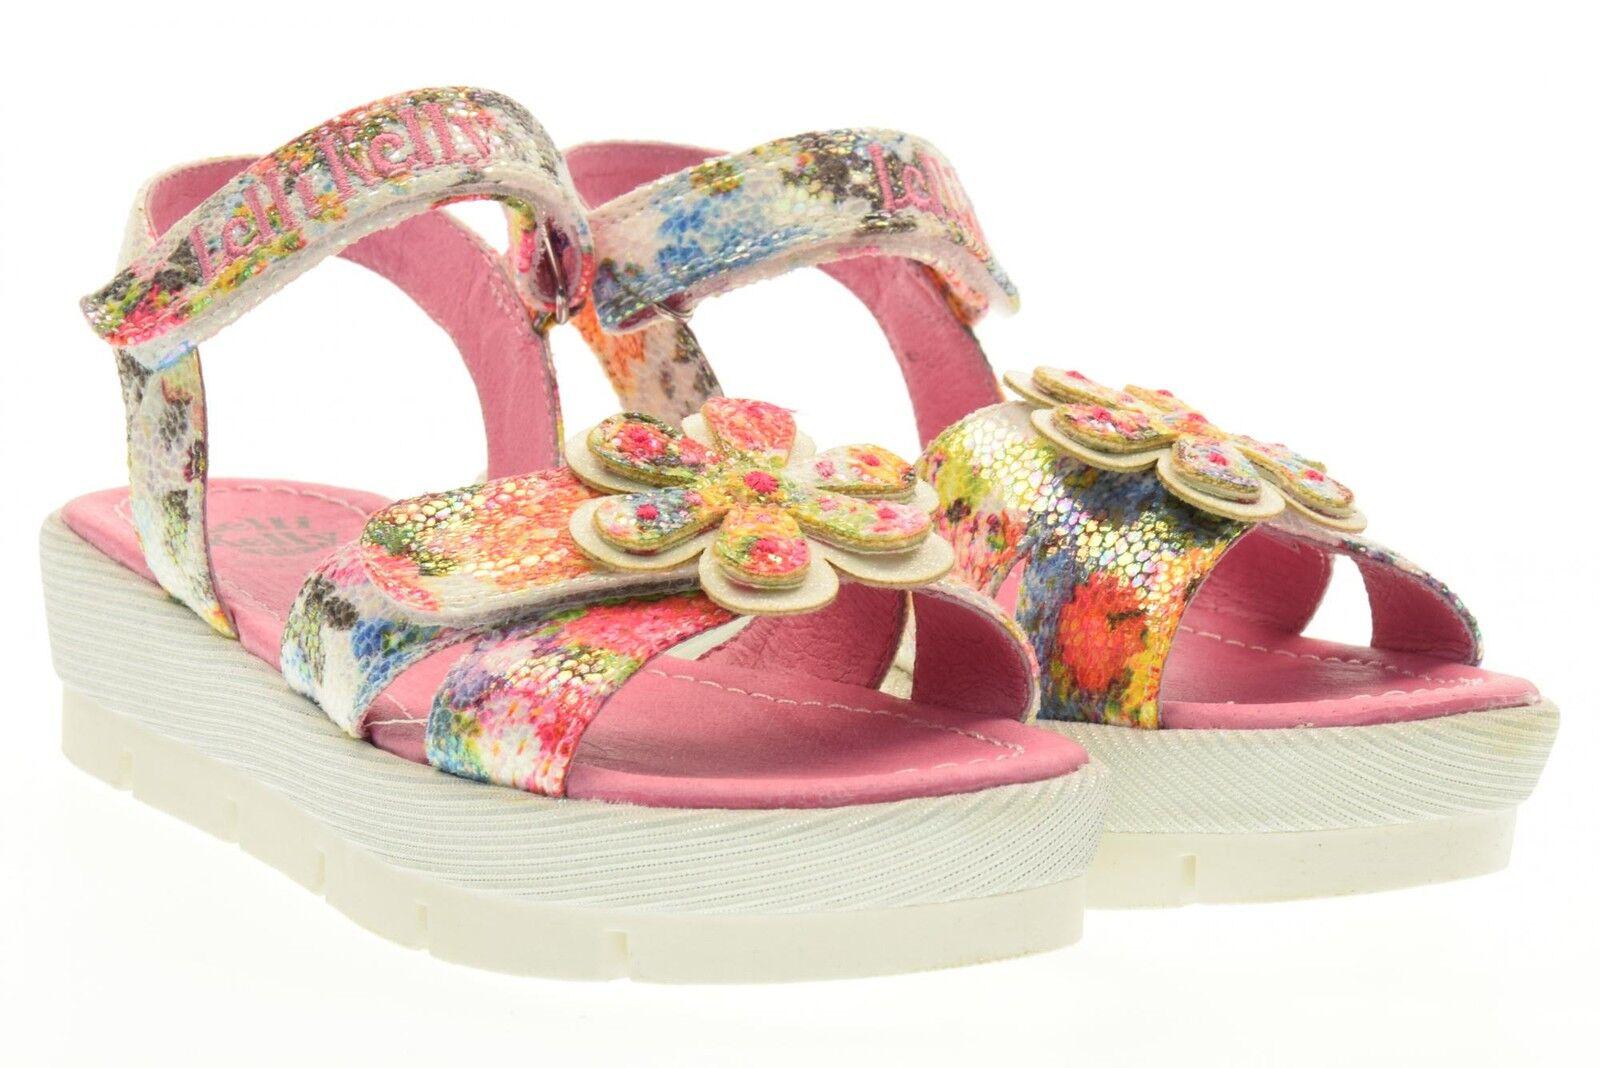 Lelli Kelly zapatos bambina sandali LK4520 FIORE FANTASIA P17